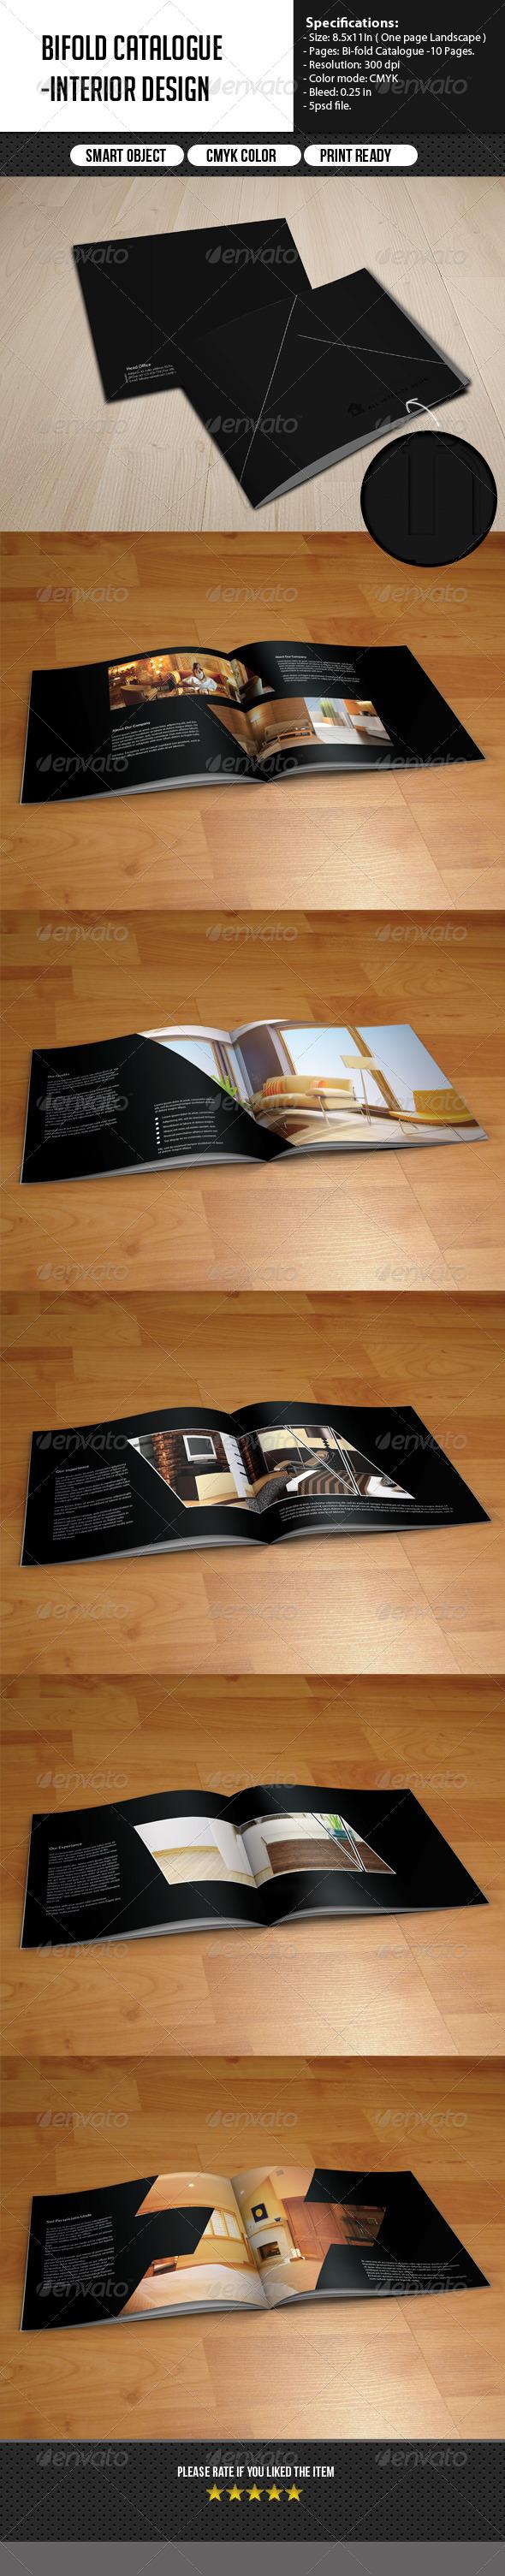 Bifold Catalog -Interior Design - Catalogs Brochures